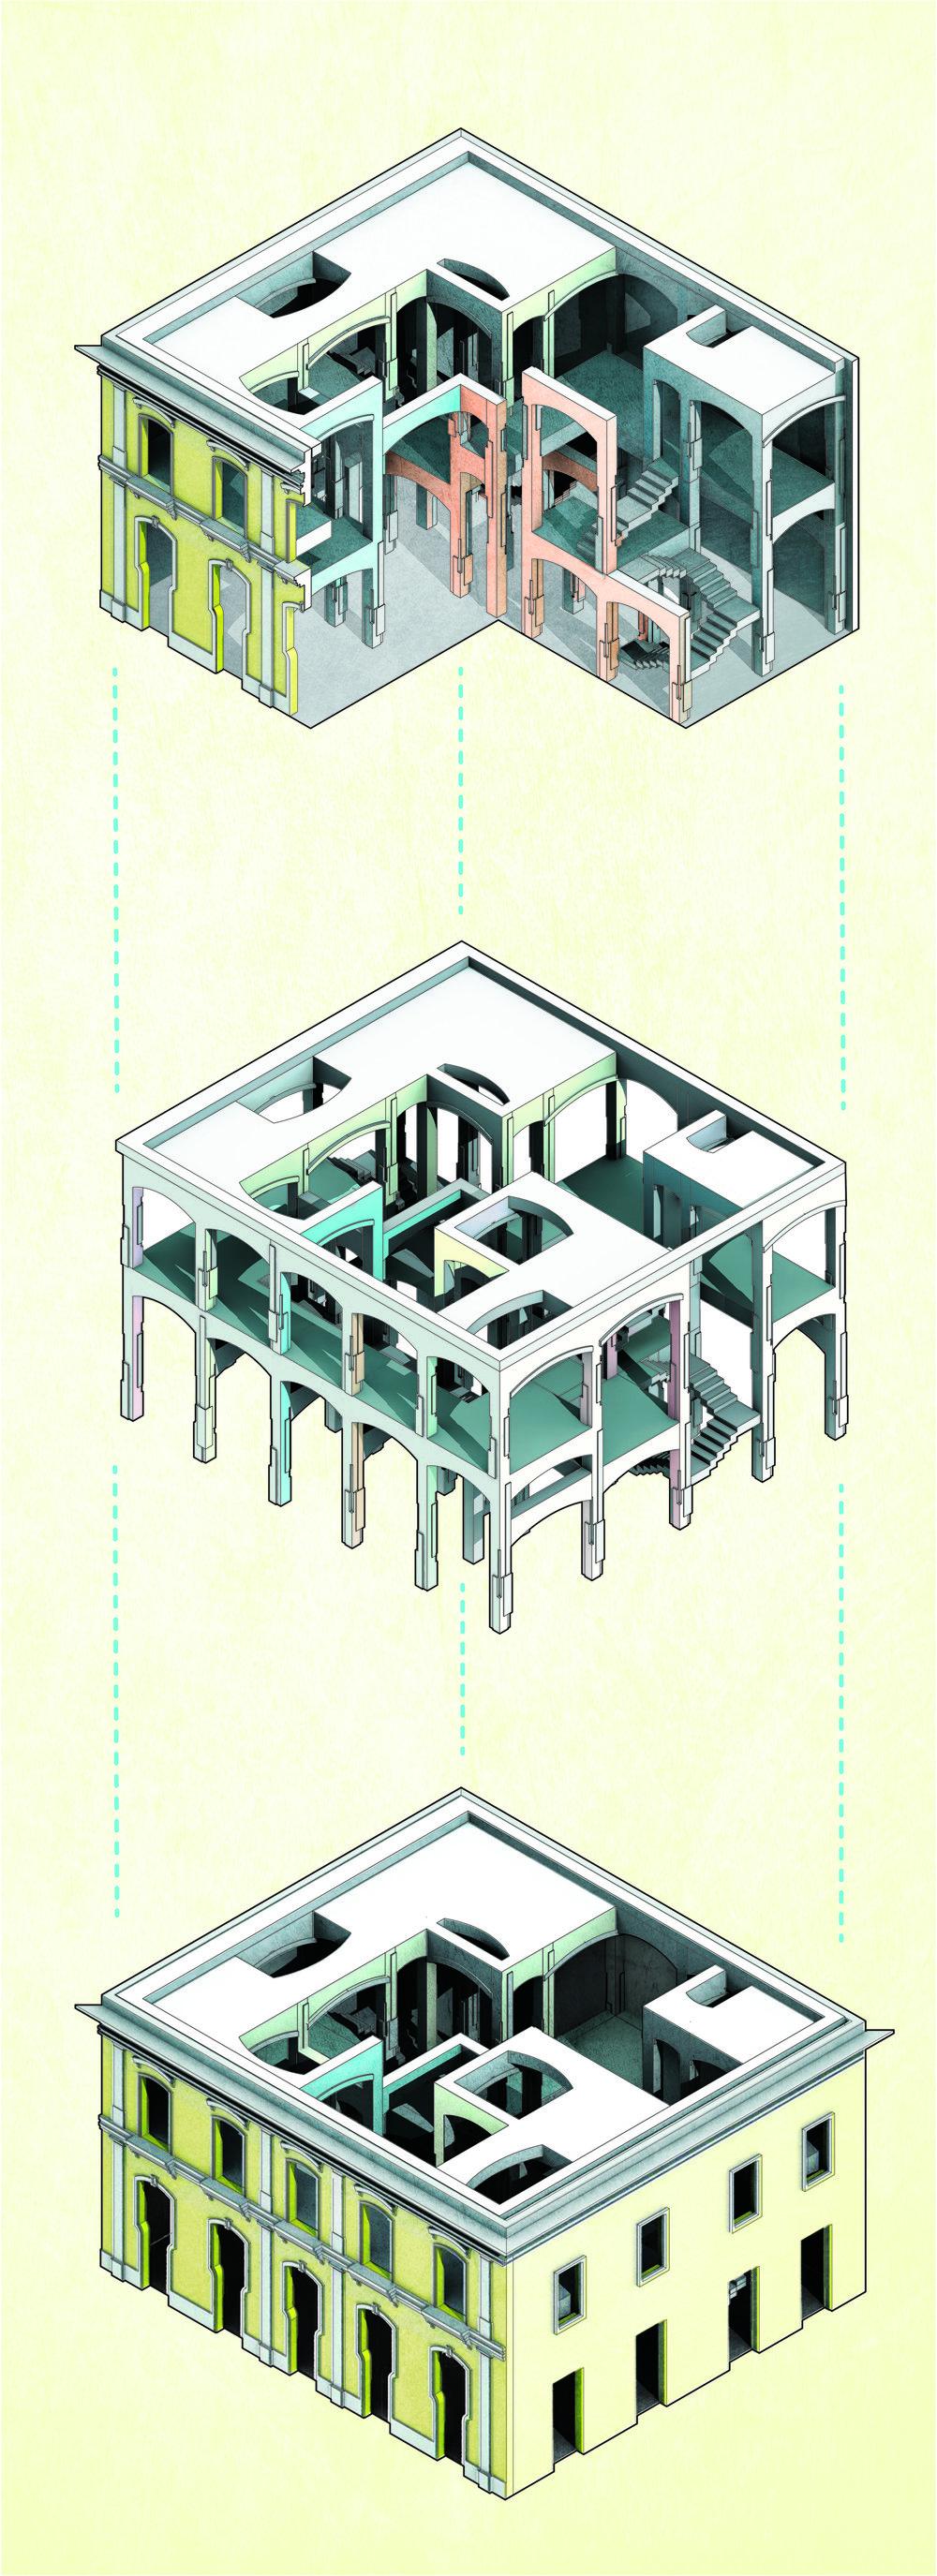 site-1-axon-11.jpg